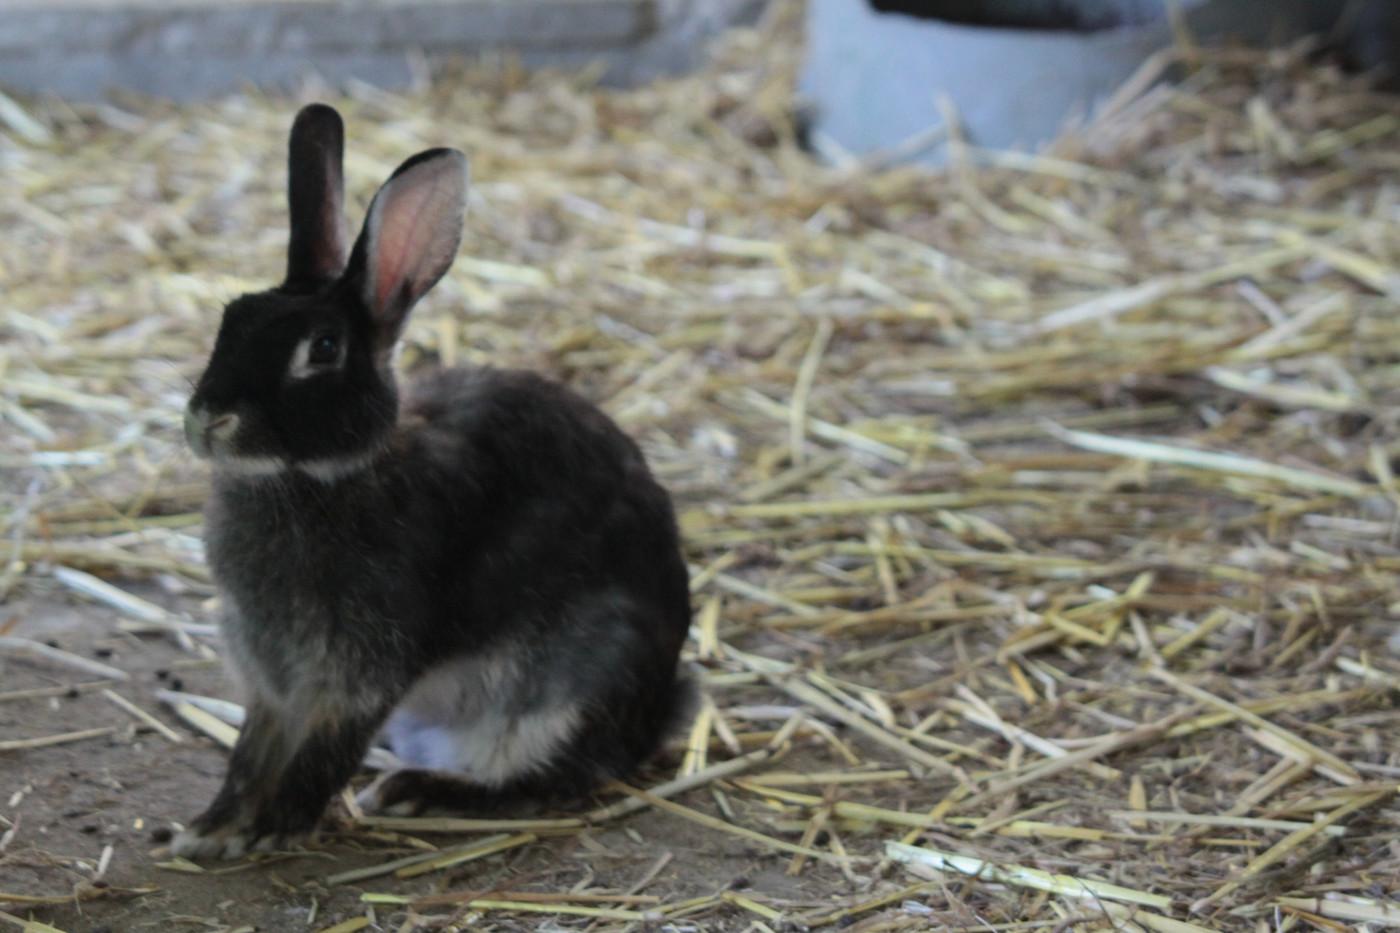 Azienda agricola coniglio - Agriturismo